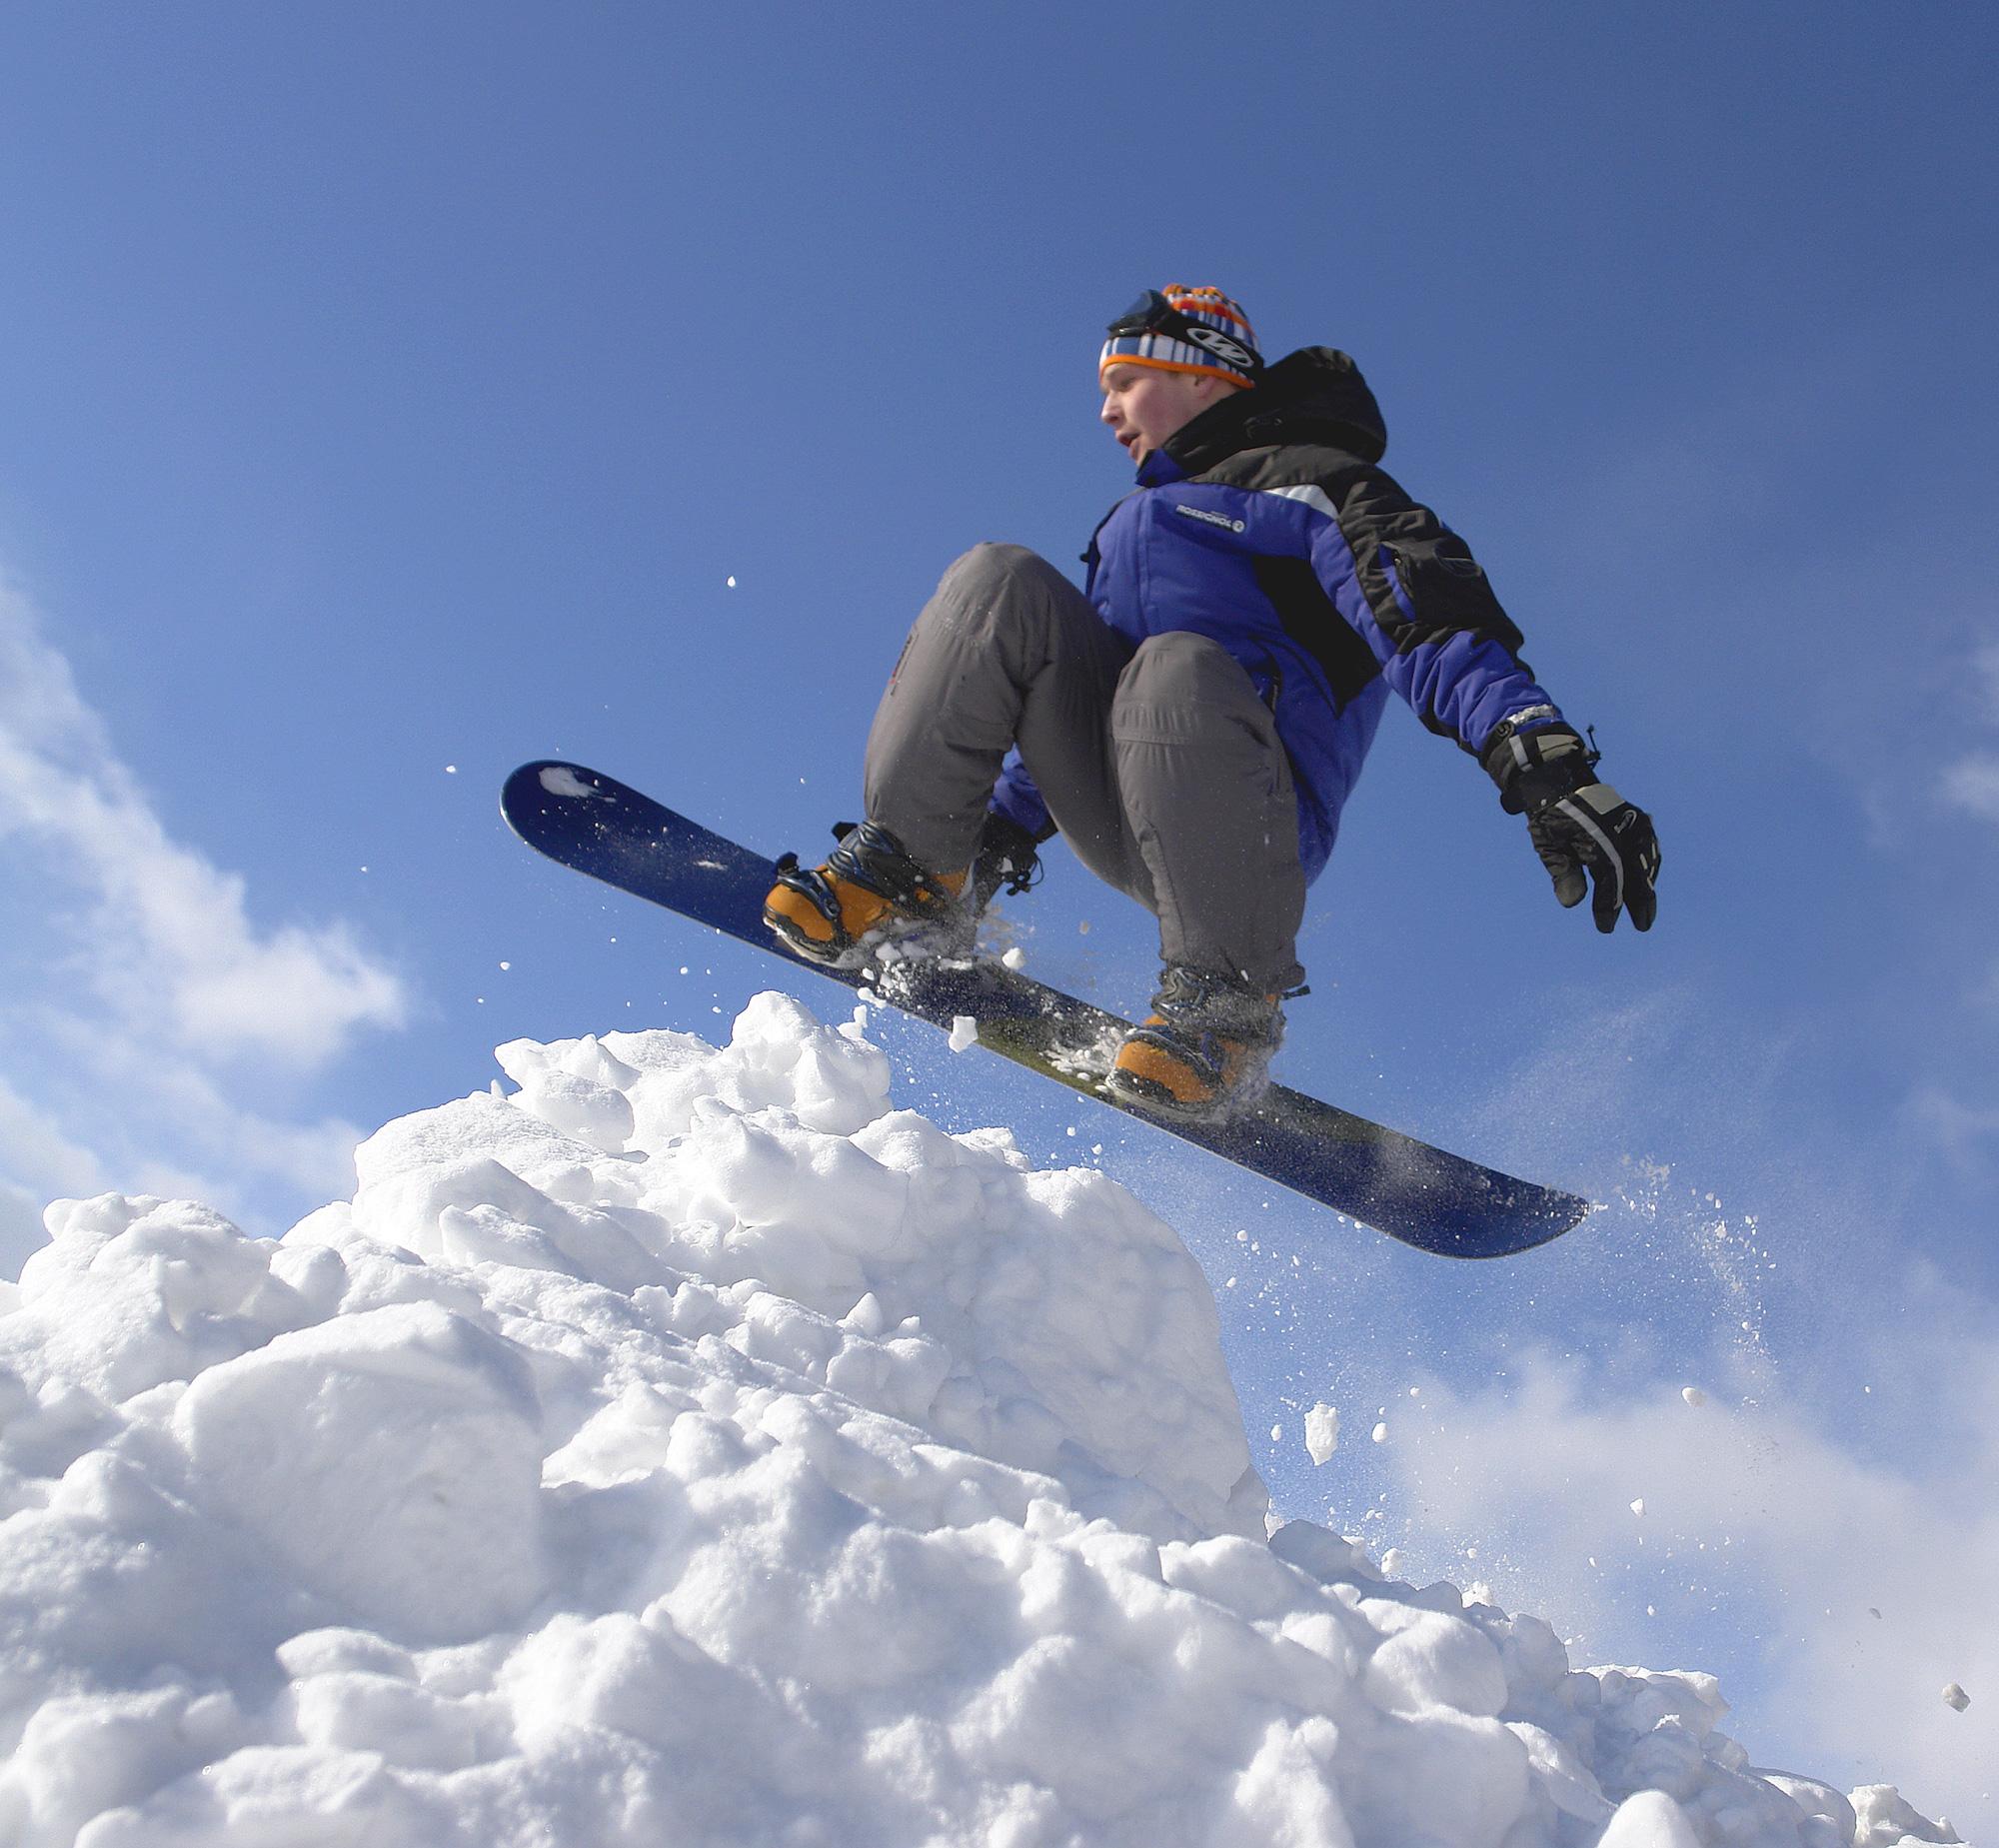 stockvault-snowboarding104275